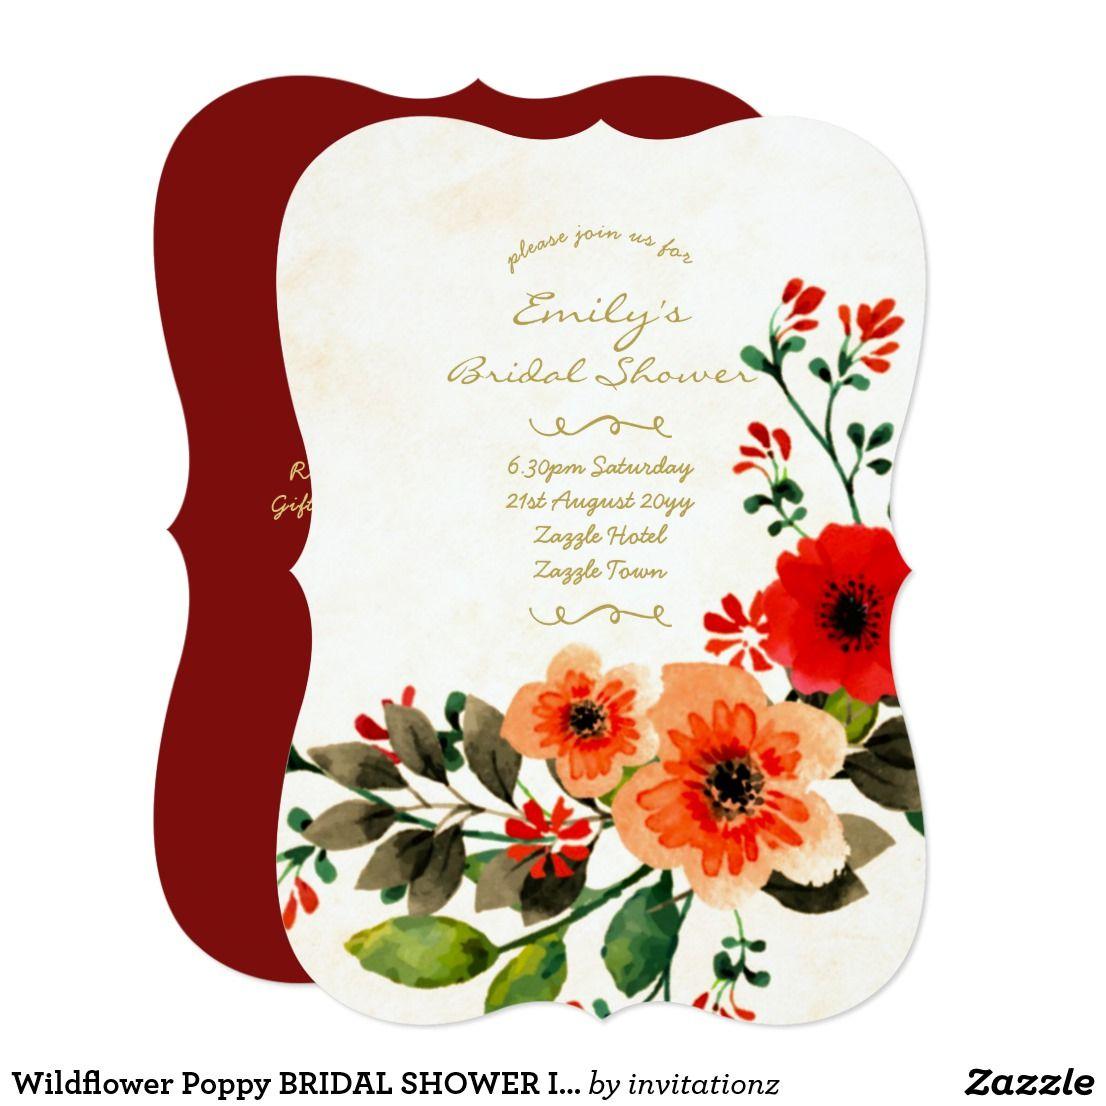 Wildflower Poppy BRIDAL SHOWER Invitations 2 | Trending Wedding ...